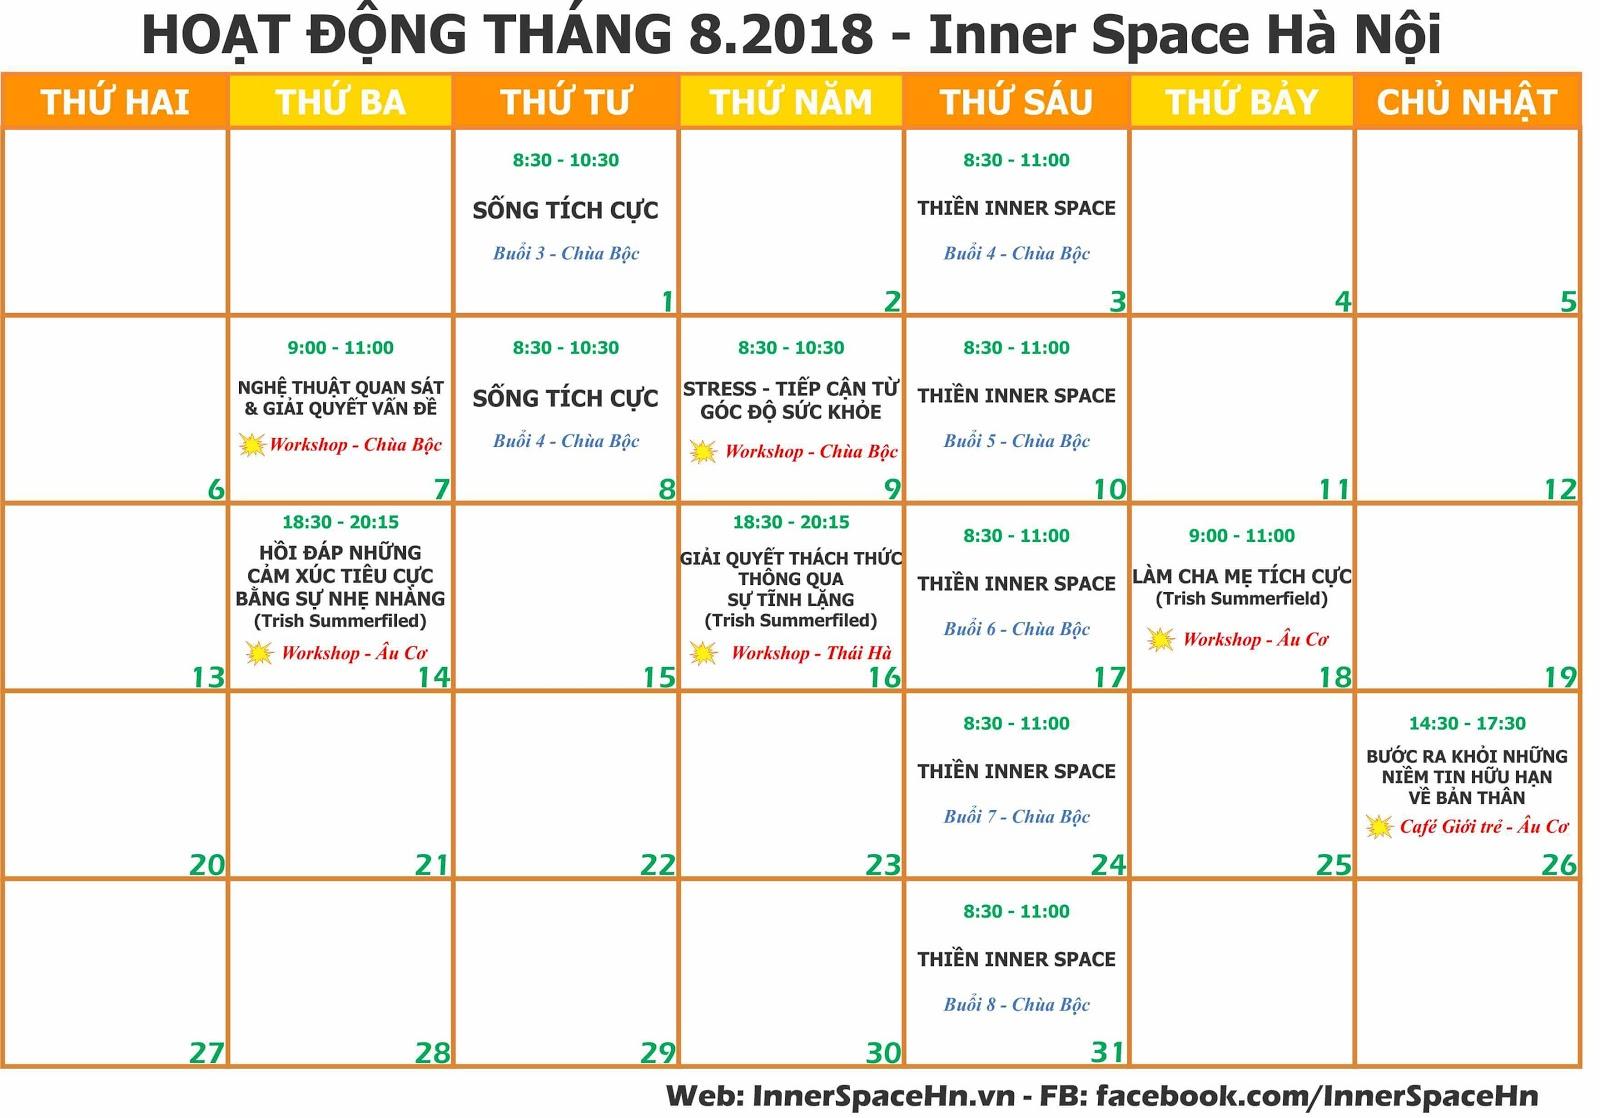 trung-tam-innerspace-song-hanh-phuc-binh-an